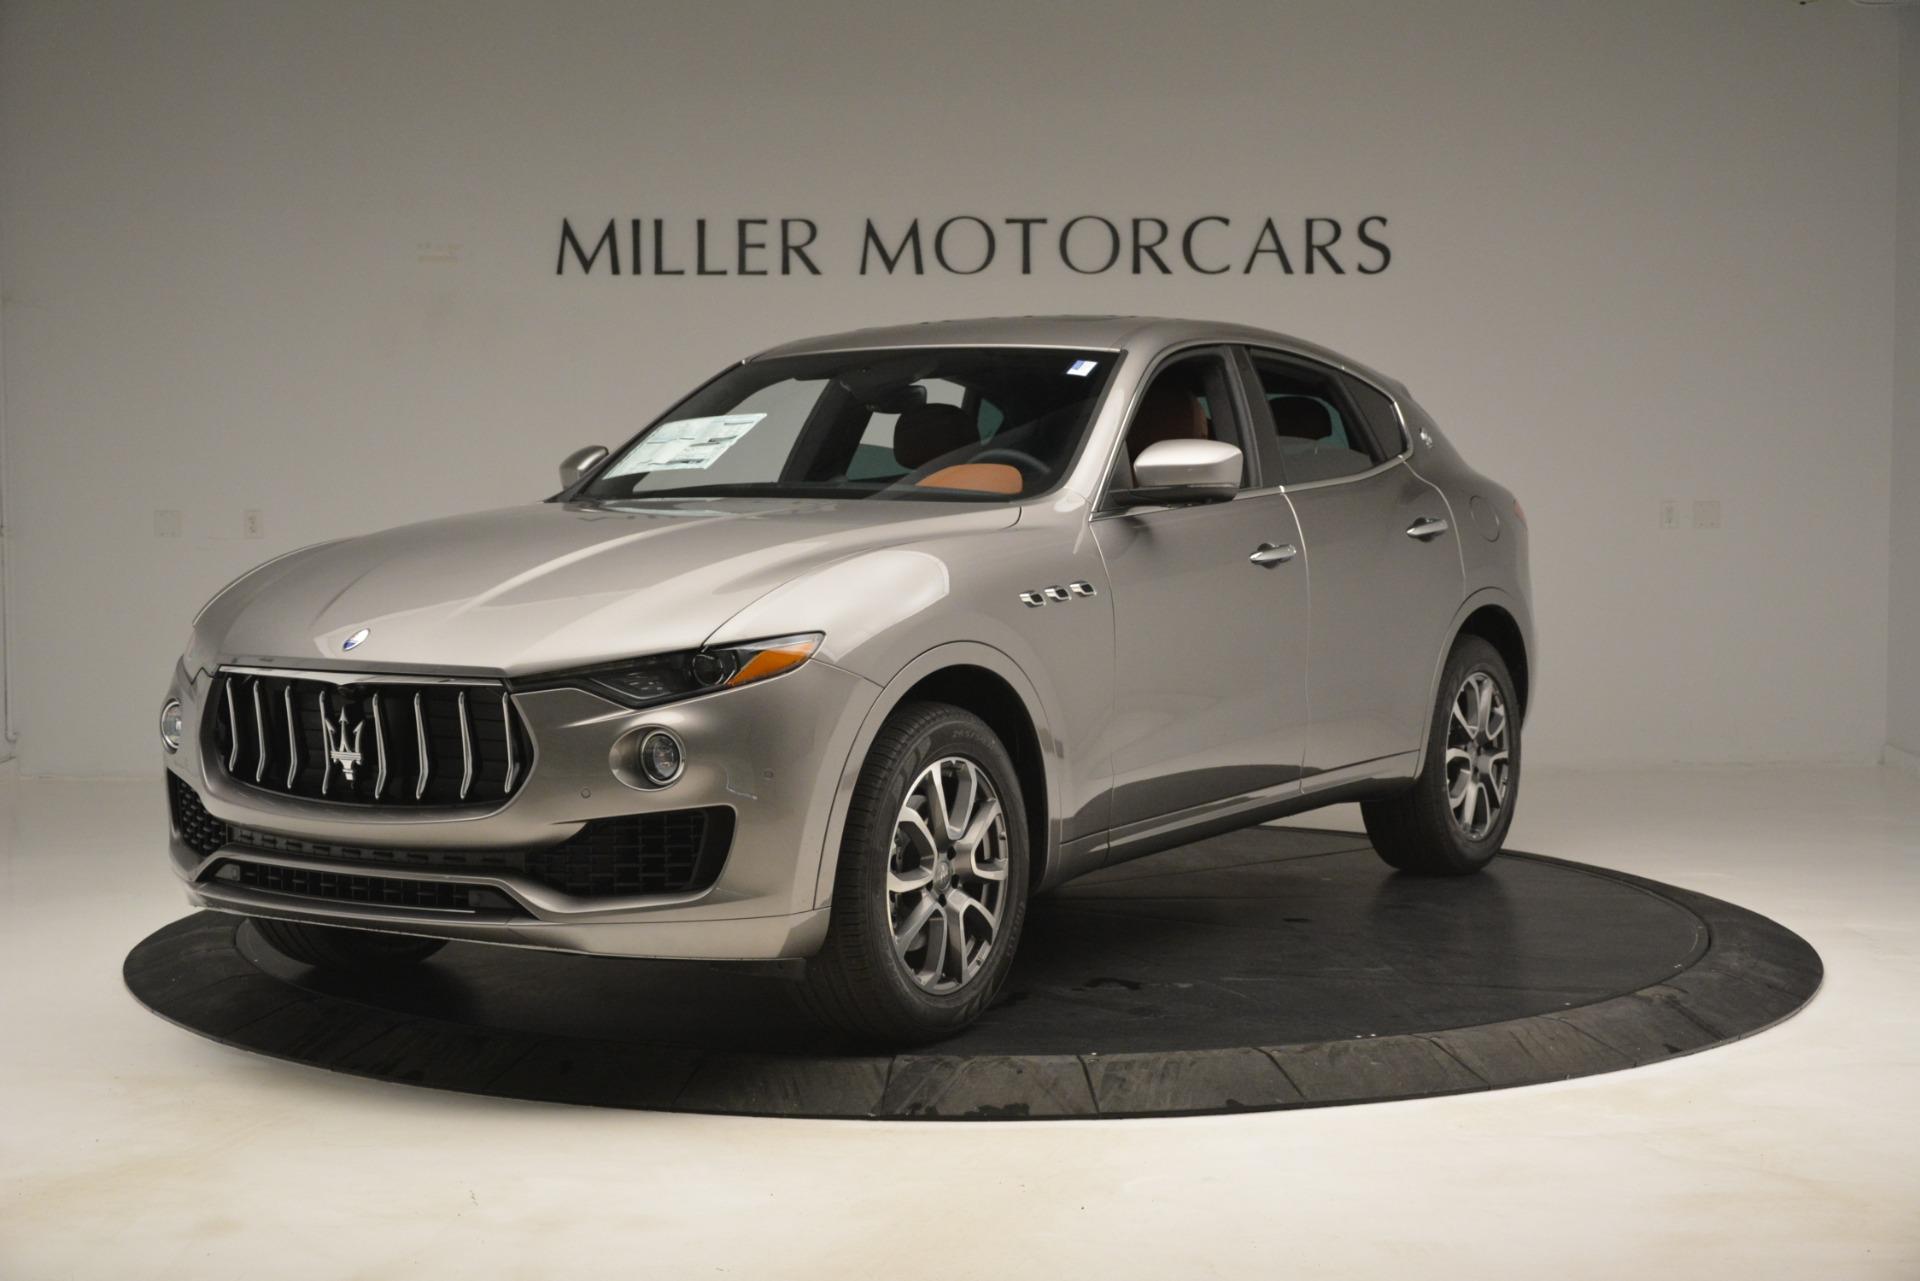 New 2019 Maserati Levante Q4 for sale $59,900 at Pagani of Greenwich in Greenwich CT 06830 1